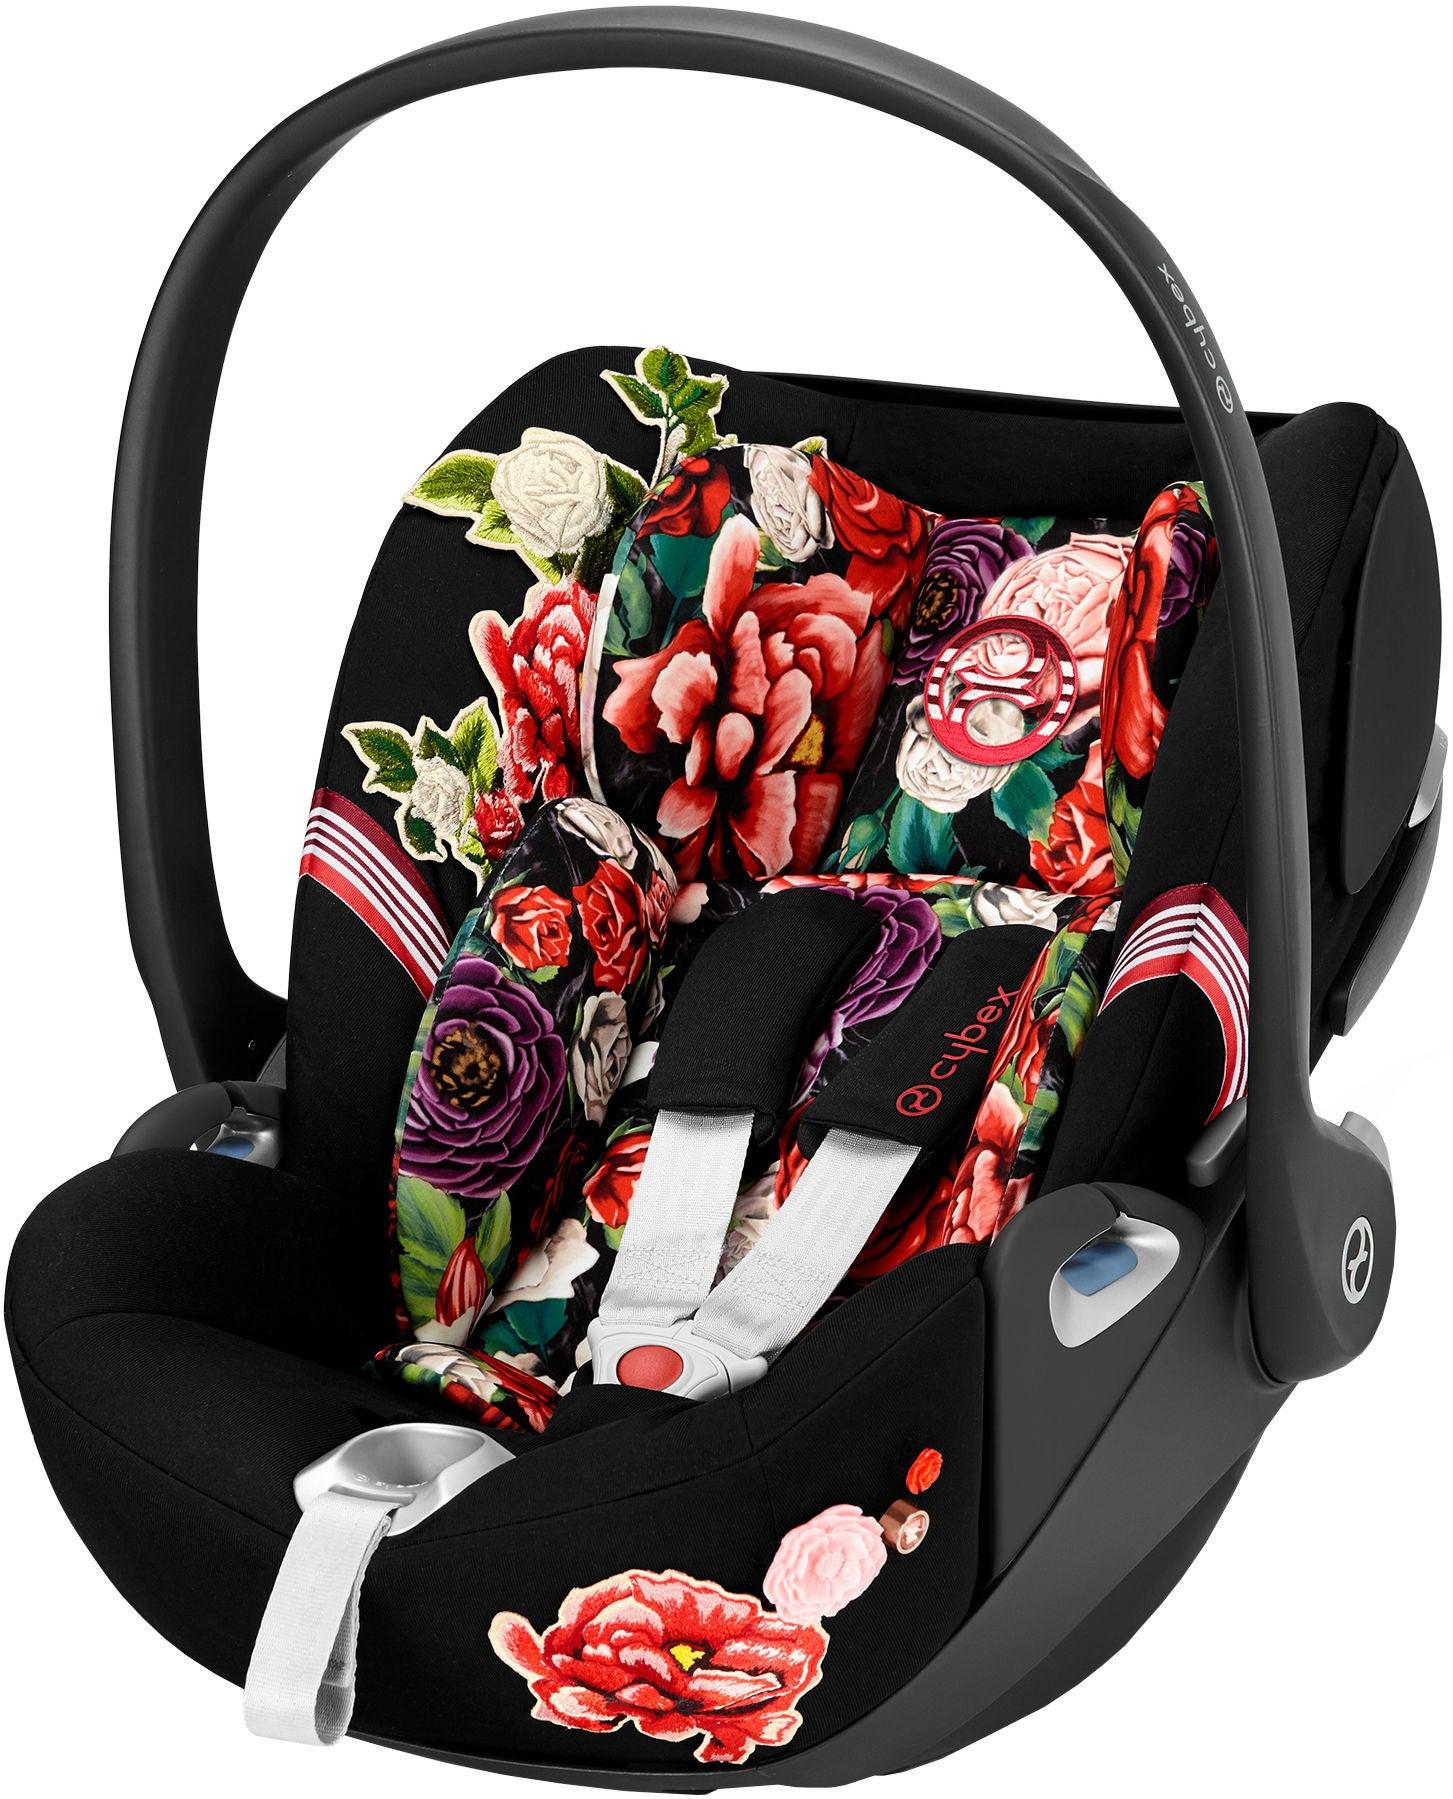 Cybex Cloud Z i-Size Babyskydd, Spring Blossom Dark